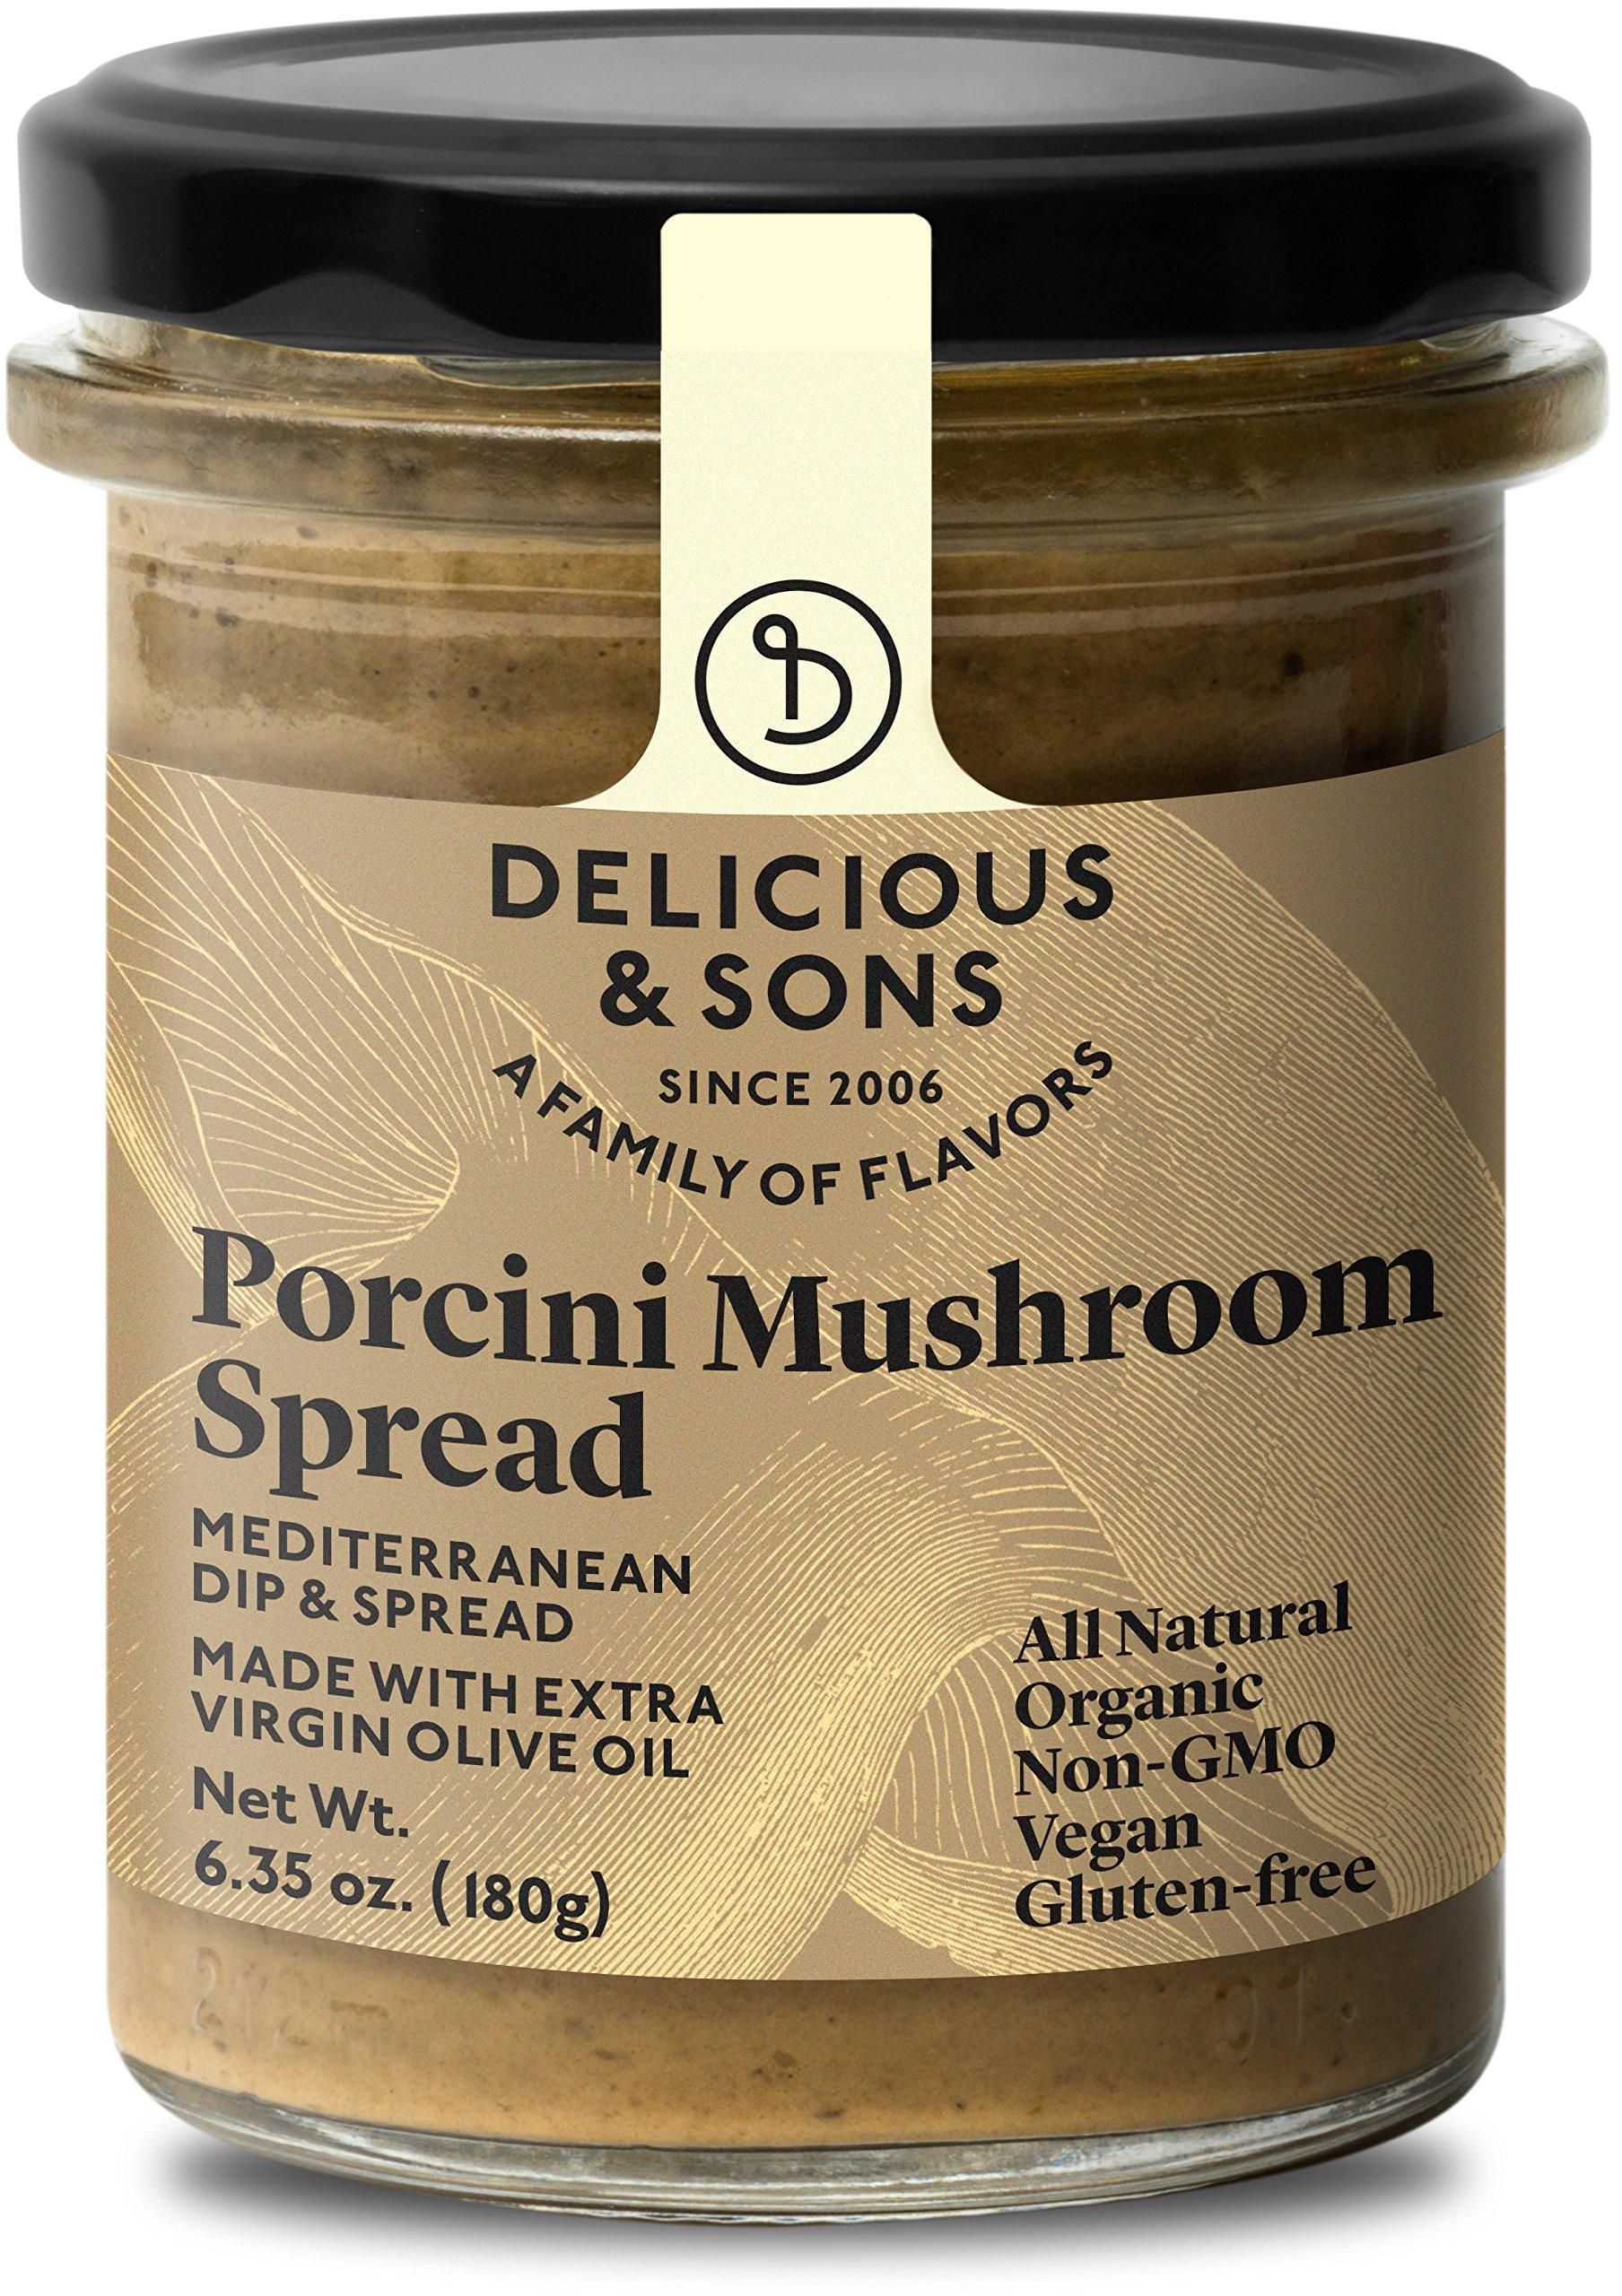 Delicious & Sons Organic Porcini Mushroom Spread 6.35 oz.…